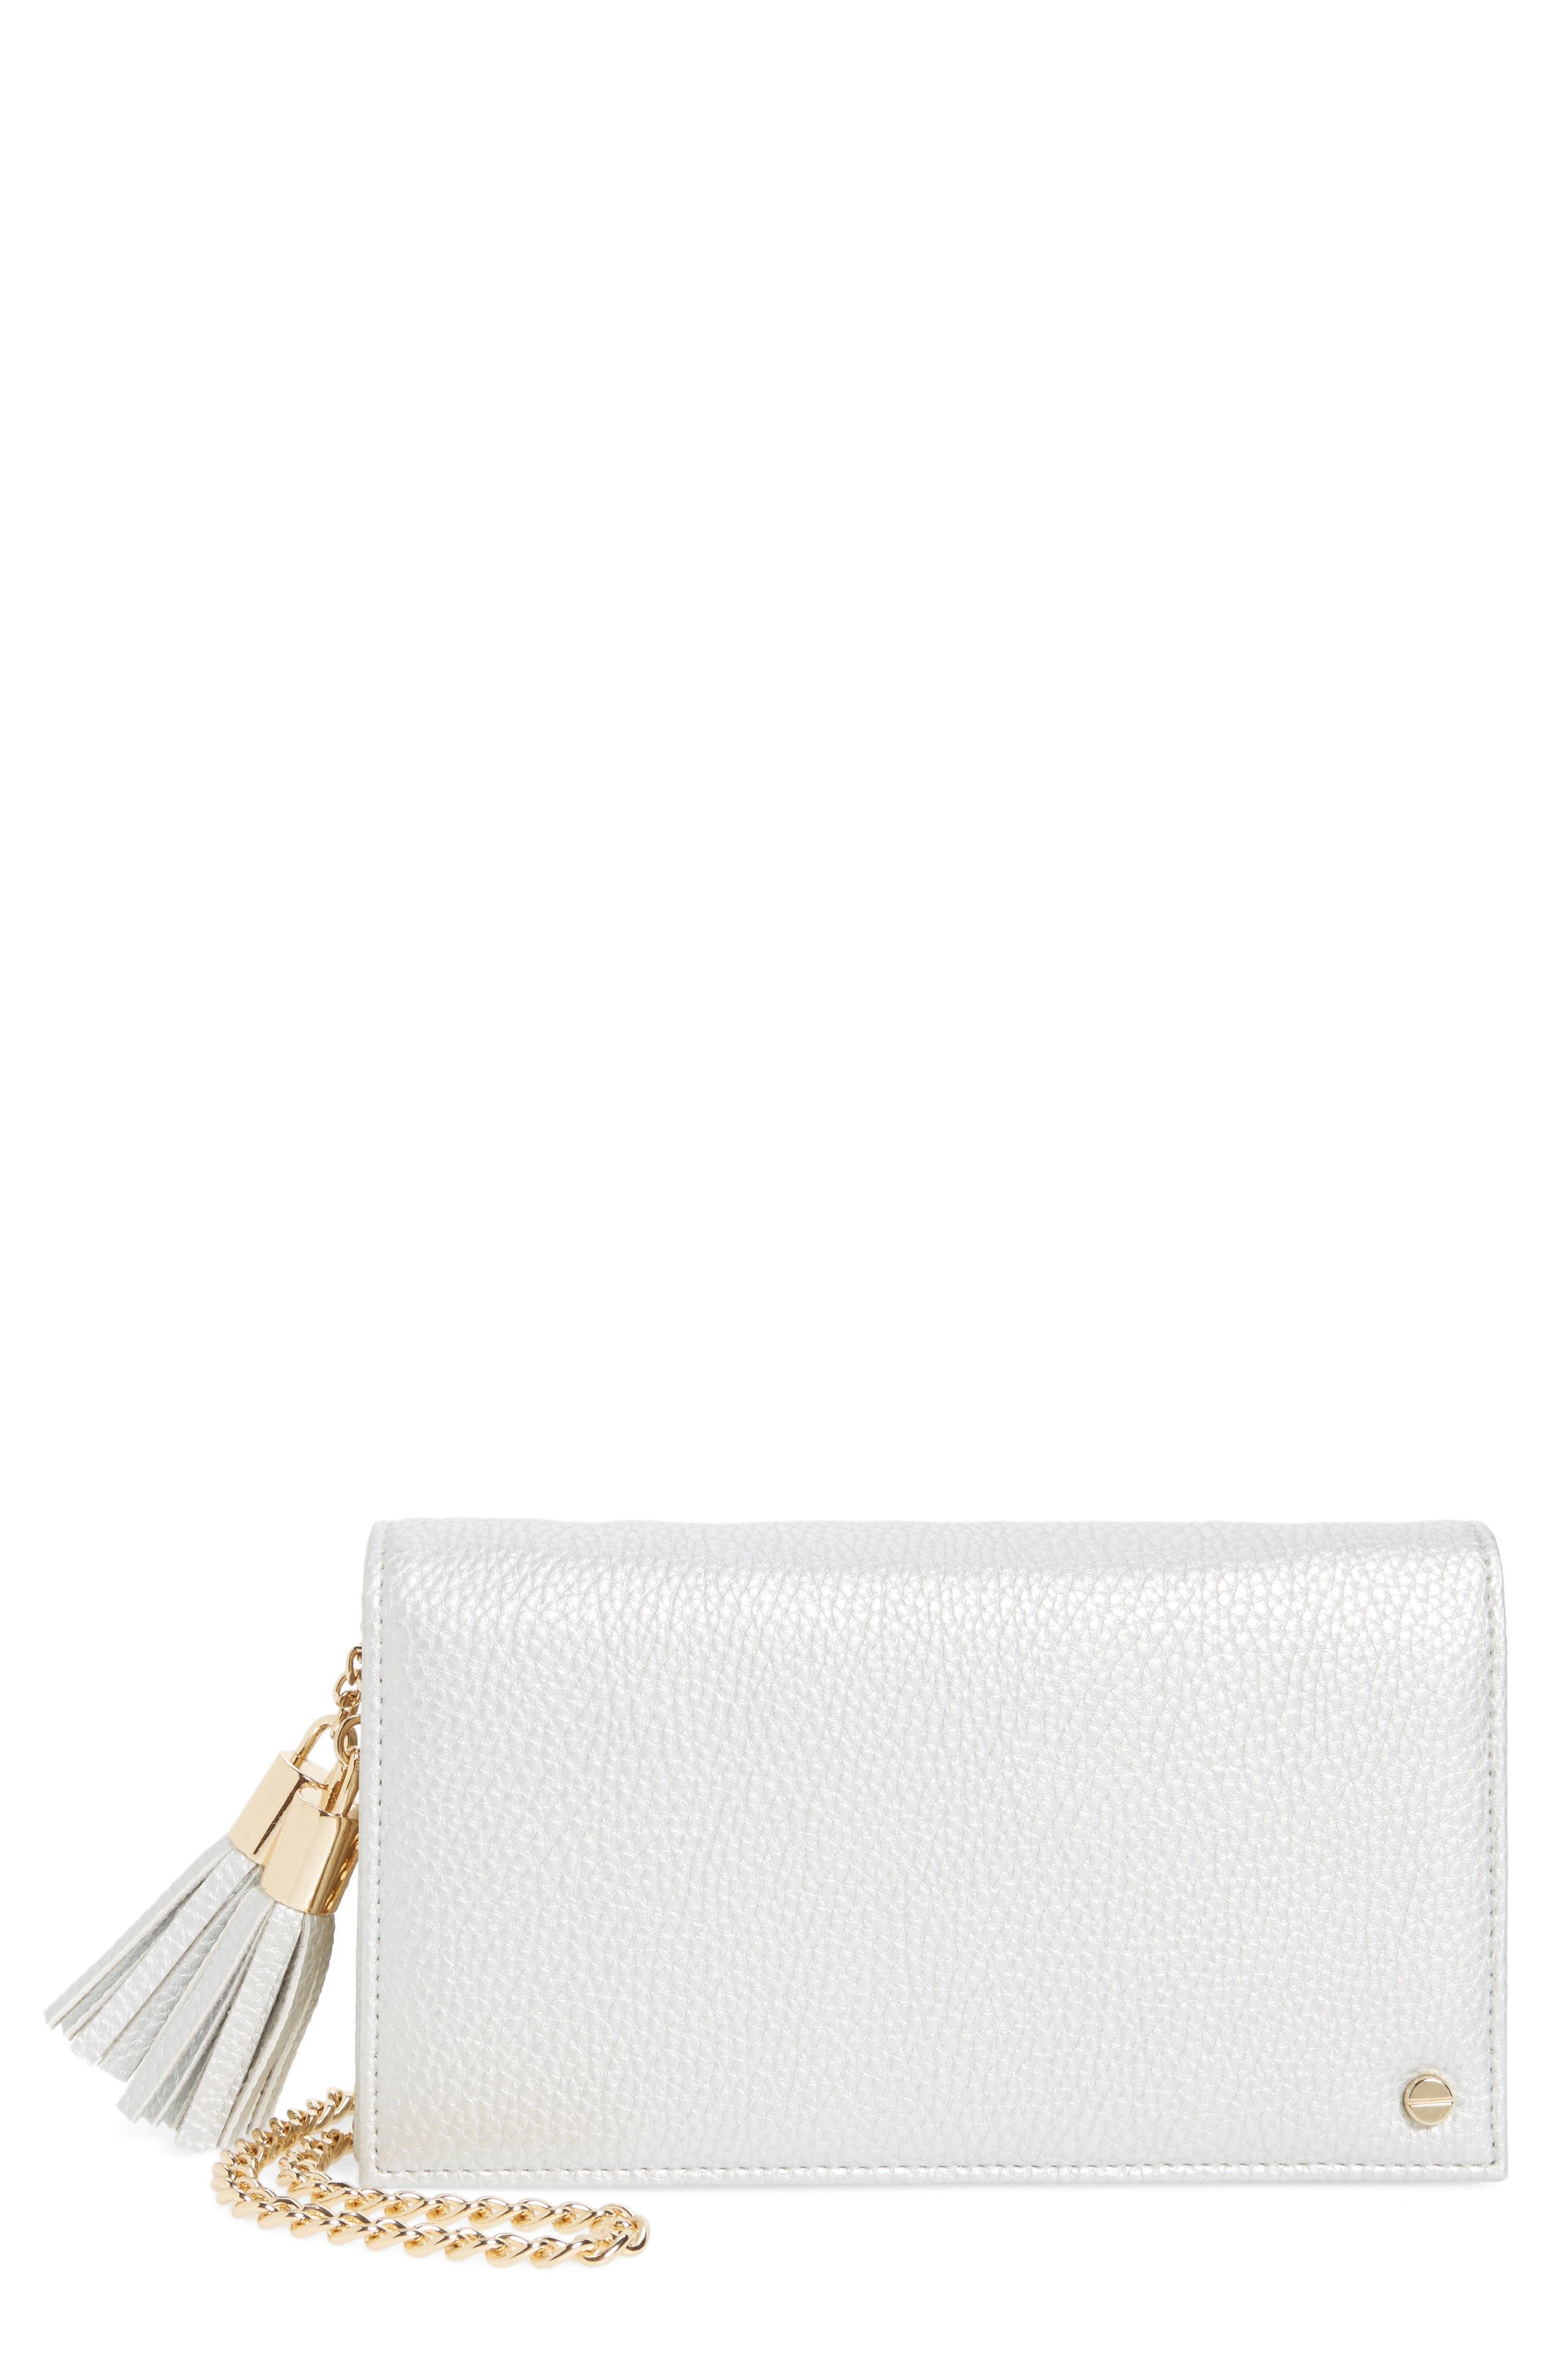 Main Image - Mali + Lili Tassel Convertible Faux Leather Clutch